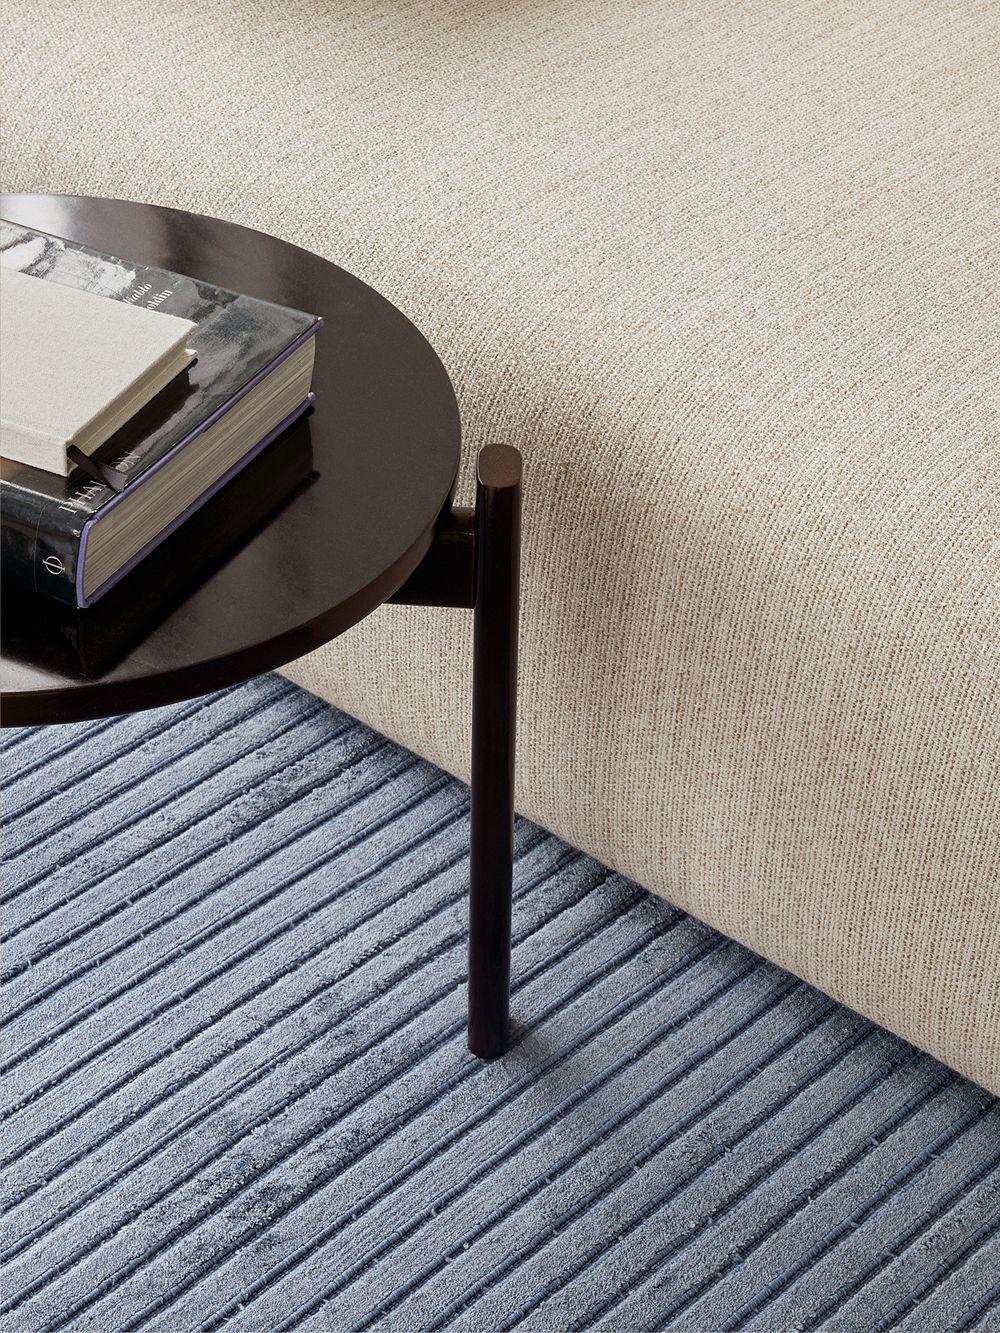 Menu's Houkime rug and Passage sofa table